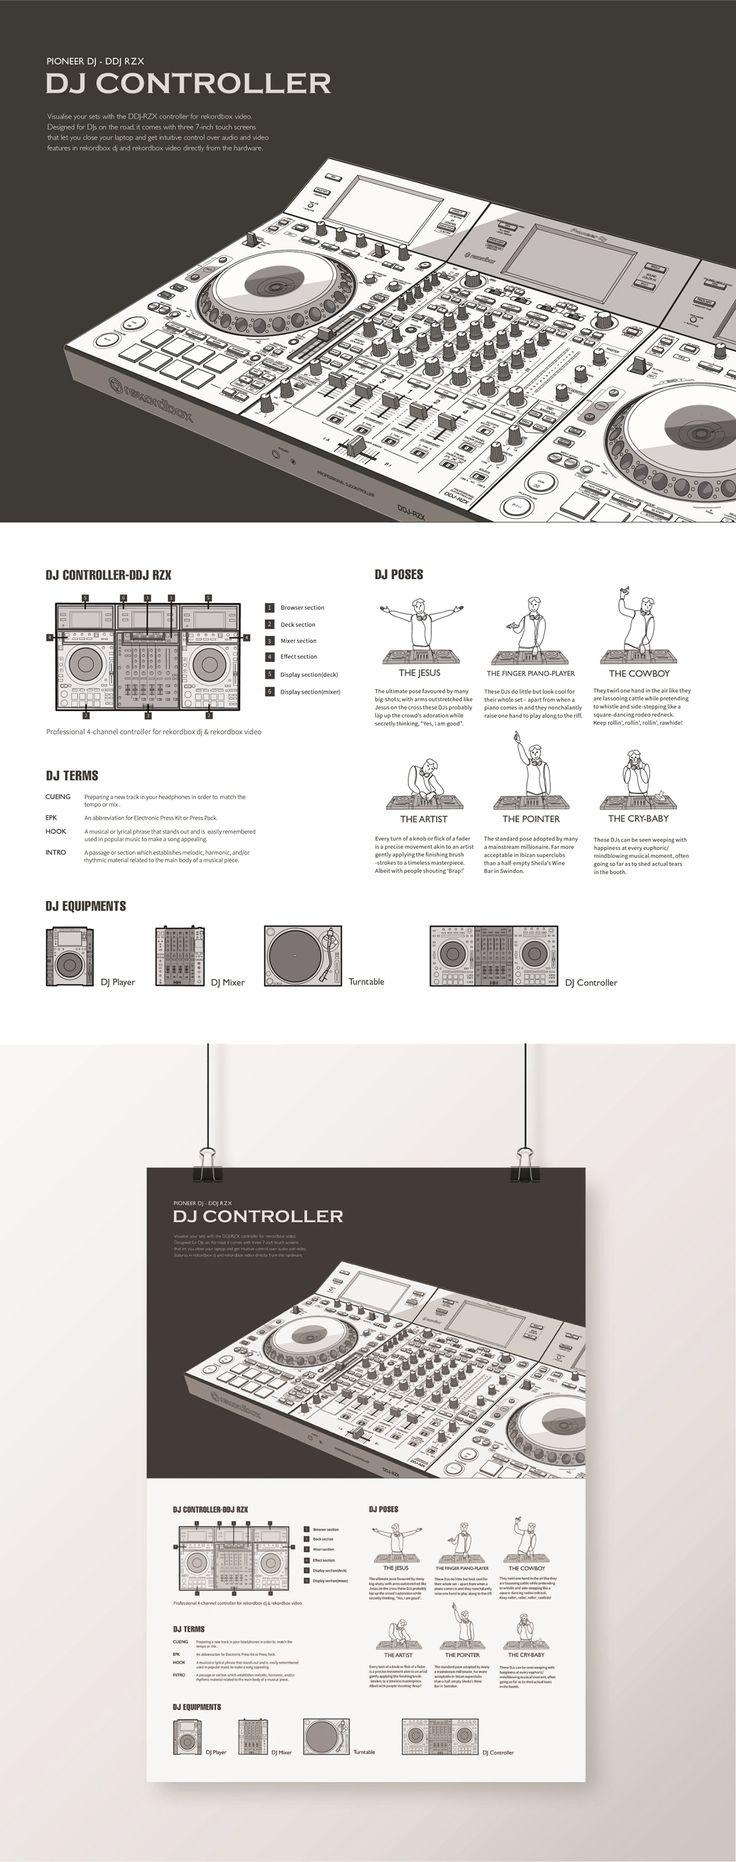 Han Seung Mi | DJ CONTROLLER | Information Design 2016│ Major in Digital Media...